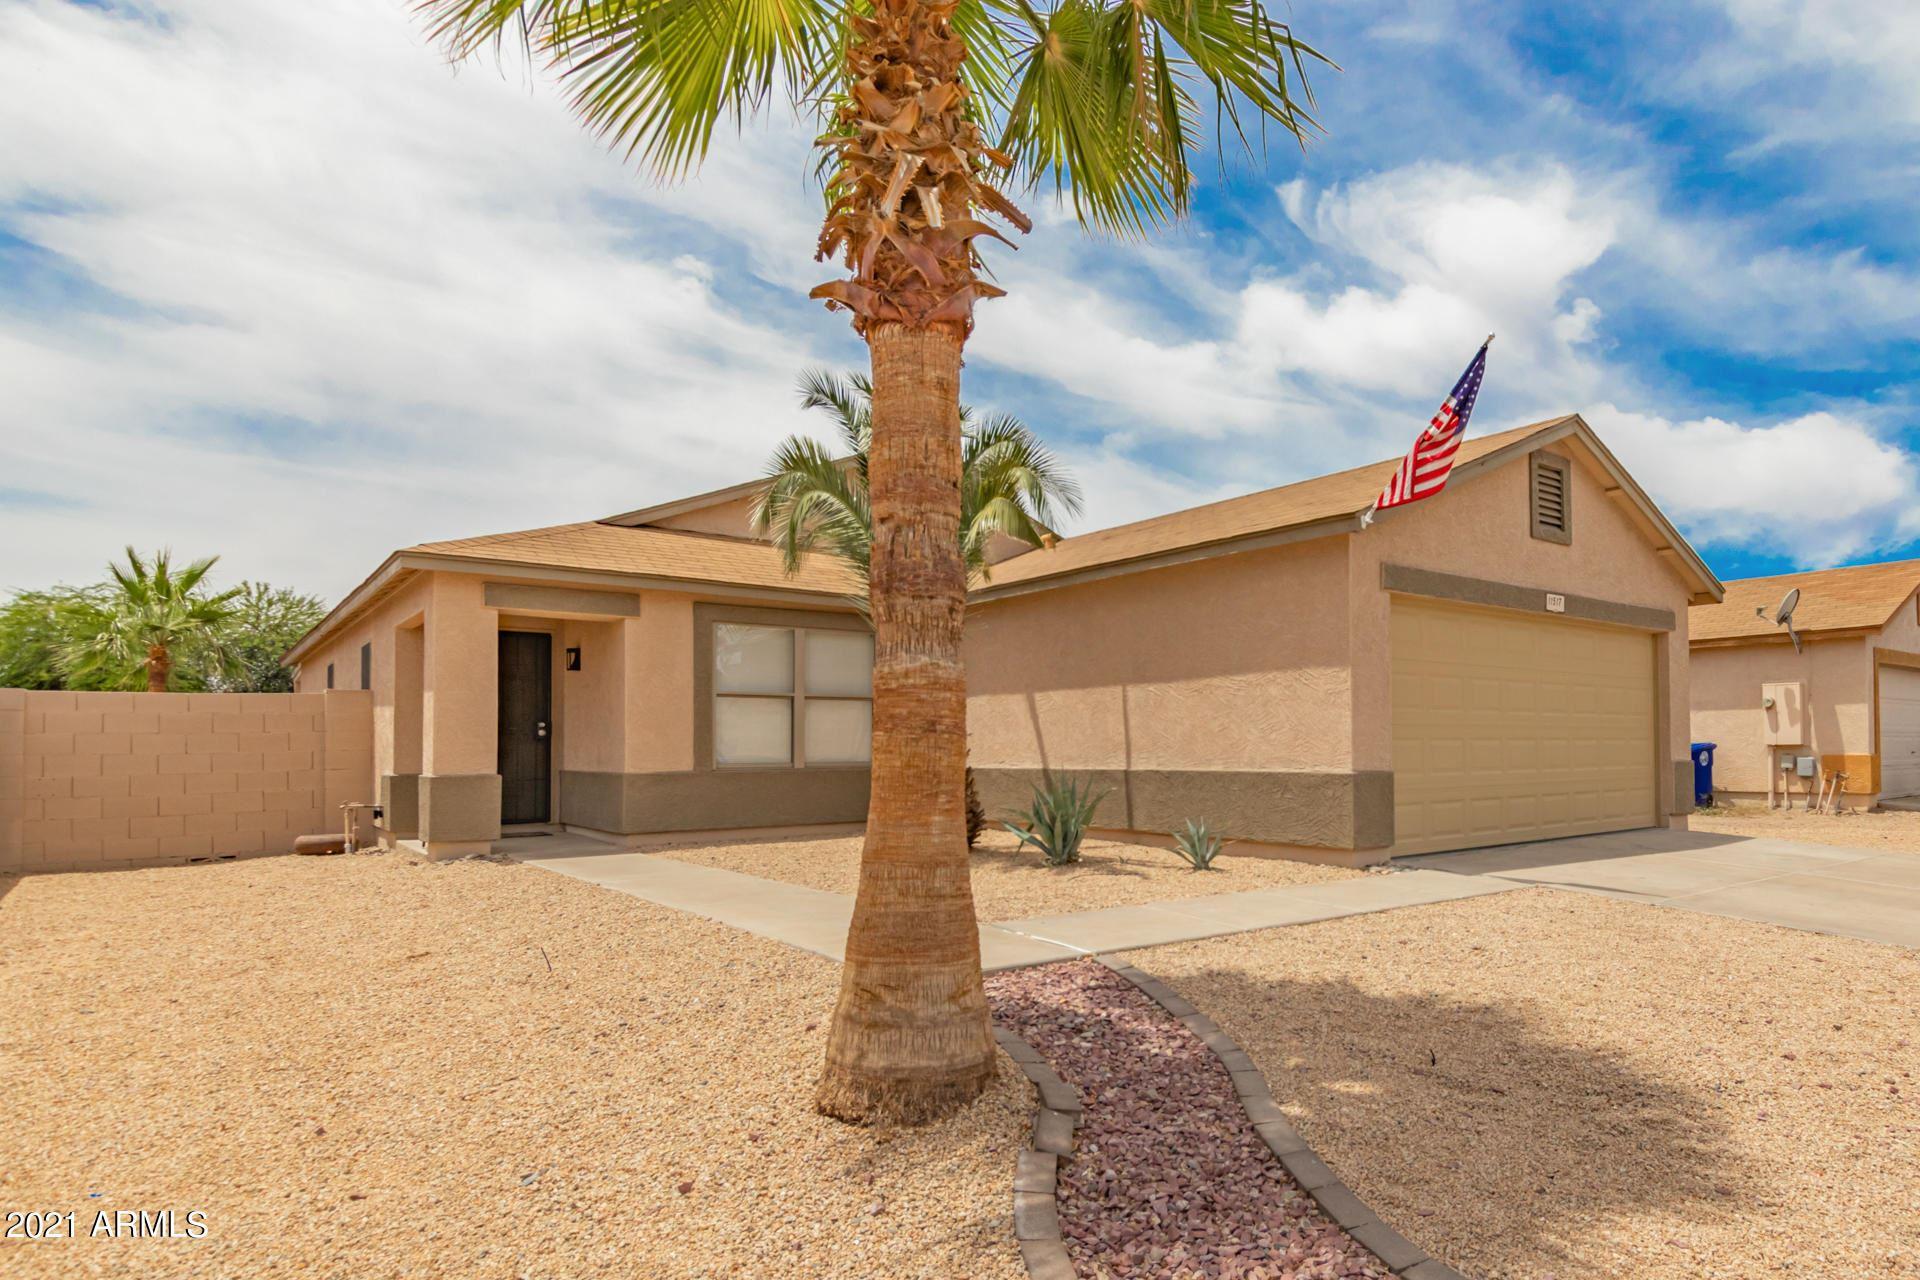 Photo of 11517 W CORRINE Drive, El Mirage, AZ 85335 (MLS # 6247829)